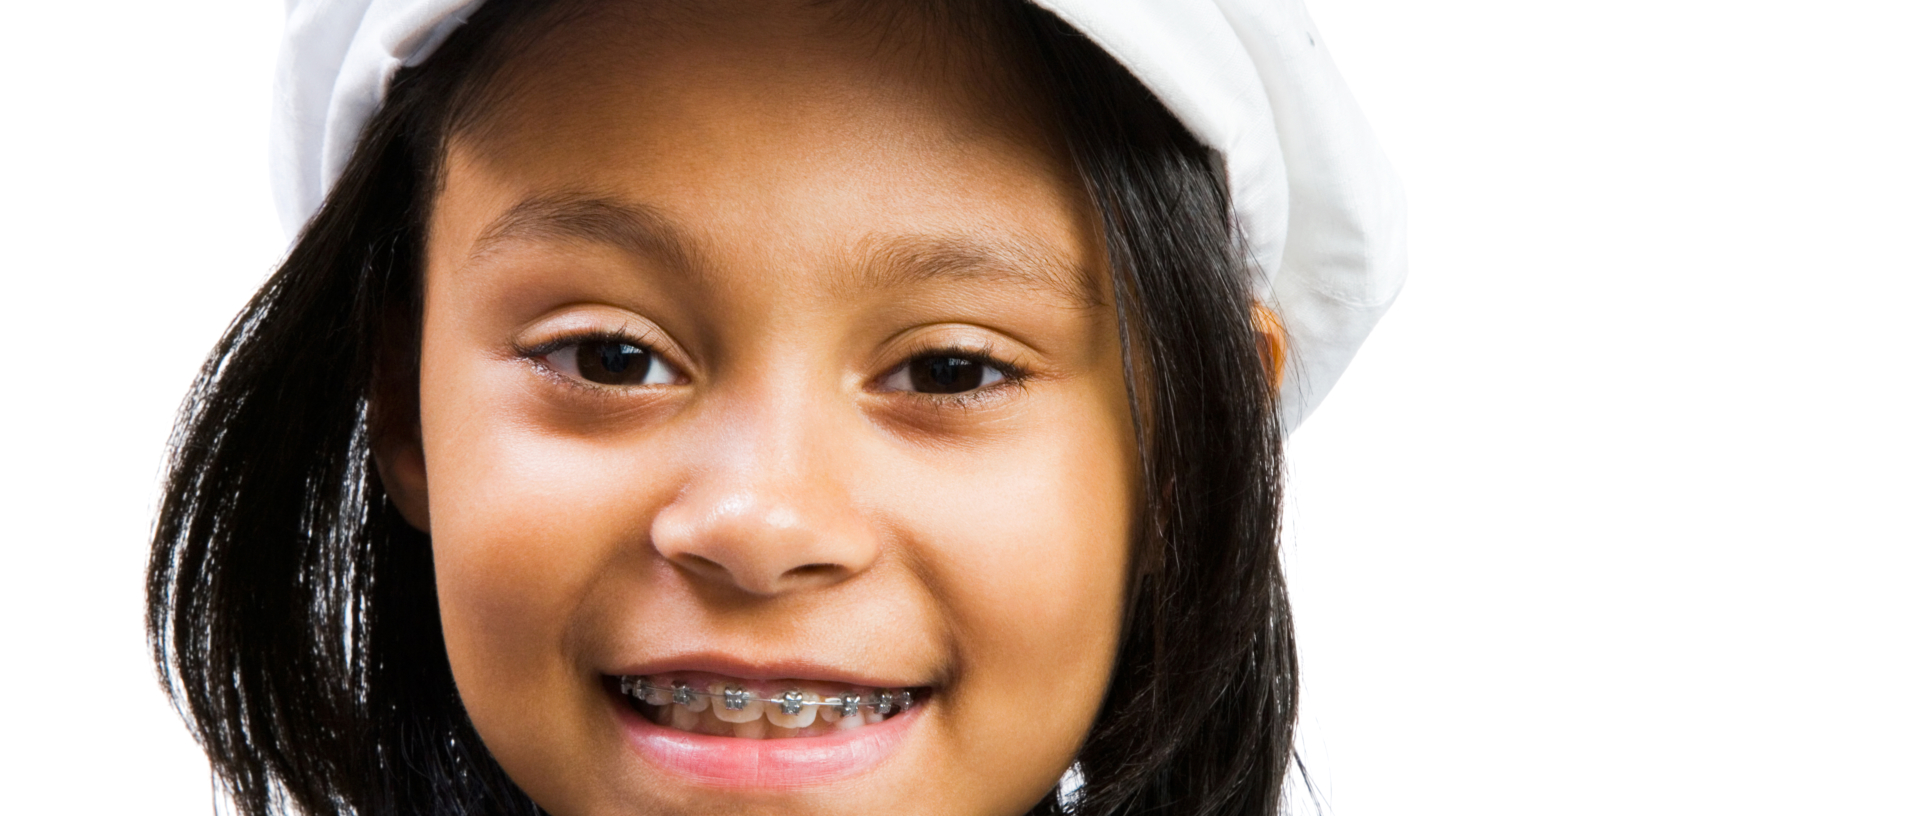 Latin American and Hispanic girl smiling